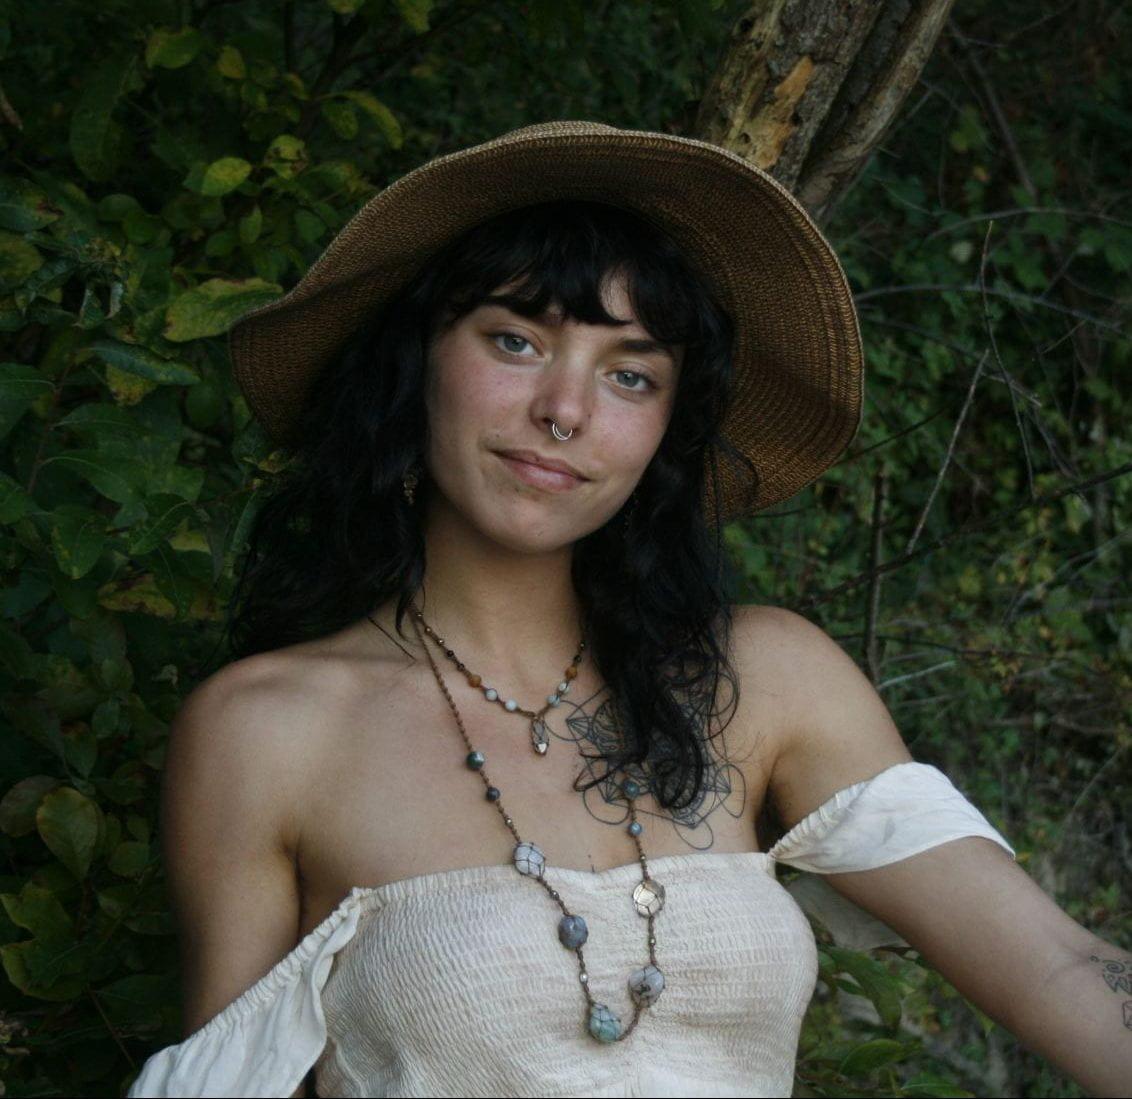 Alysa Gallant